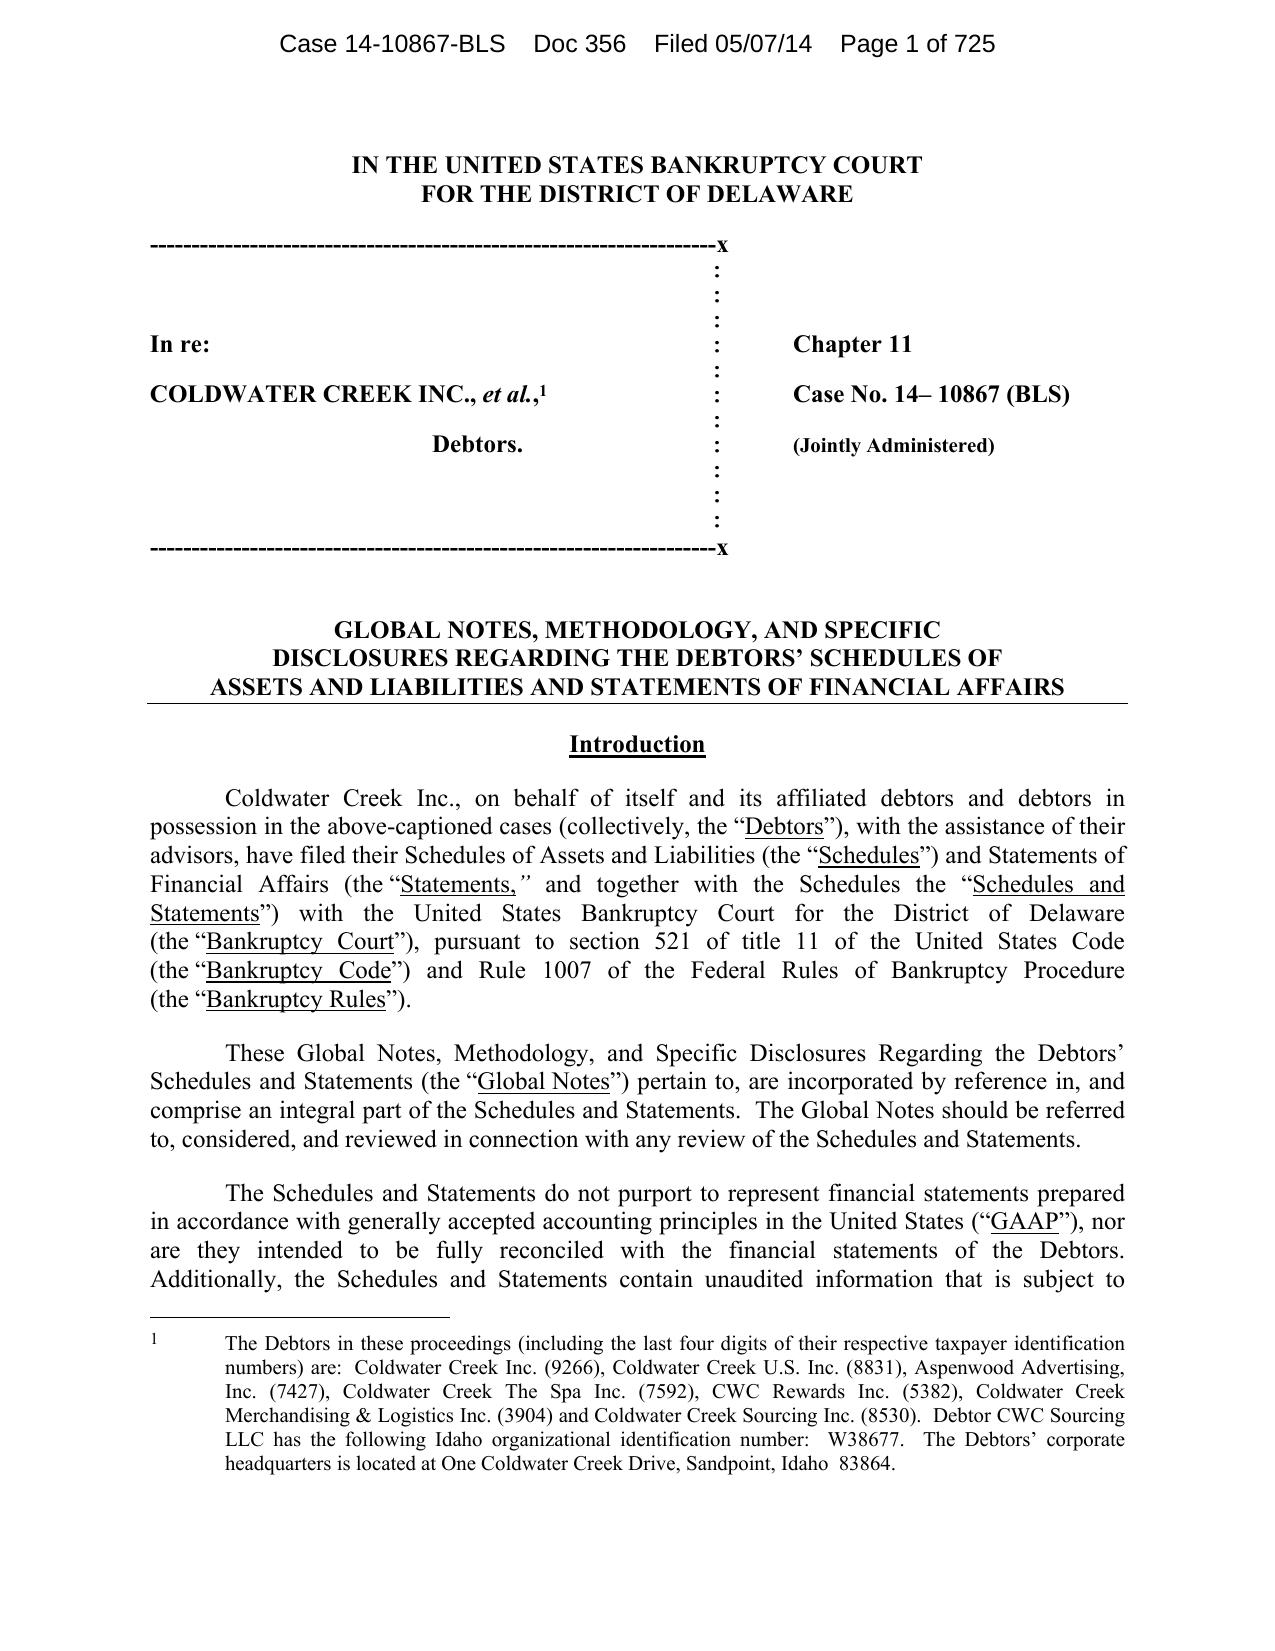 clark county ohio bankruptcy court records